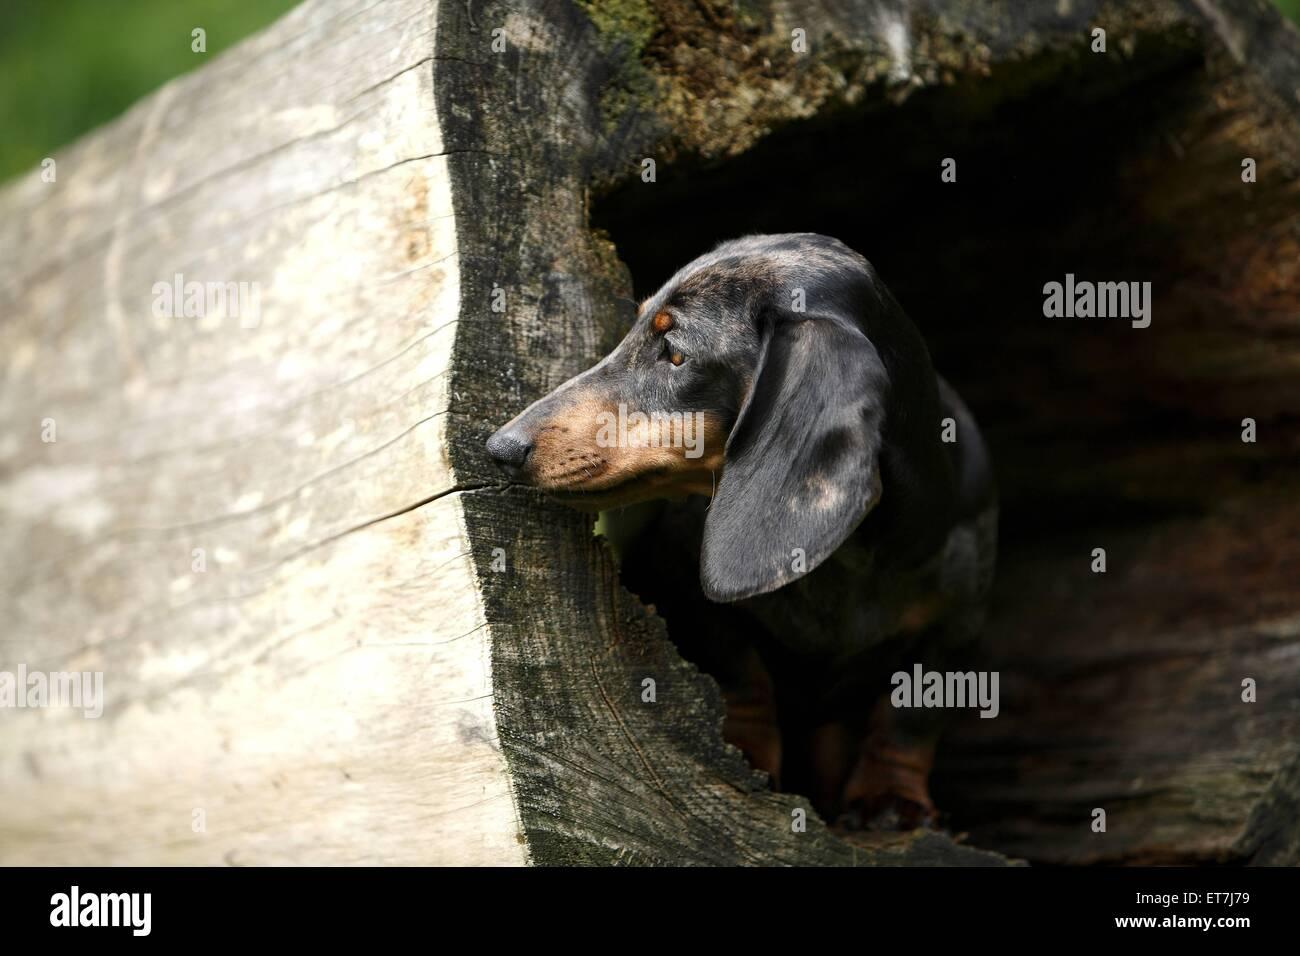 Kurzhaardackel, Kurzhaar-Dackel, Kurzhaarteckel, Kurzhaar-Teckel, Teckel, Dachshund (Canis lupus f. familiaris), Stock Photo